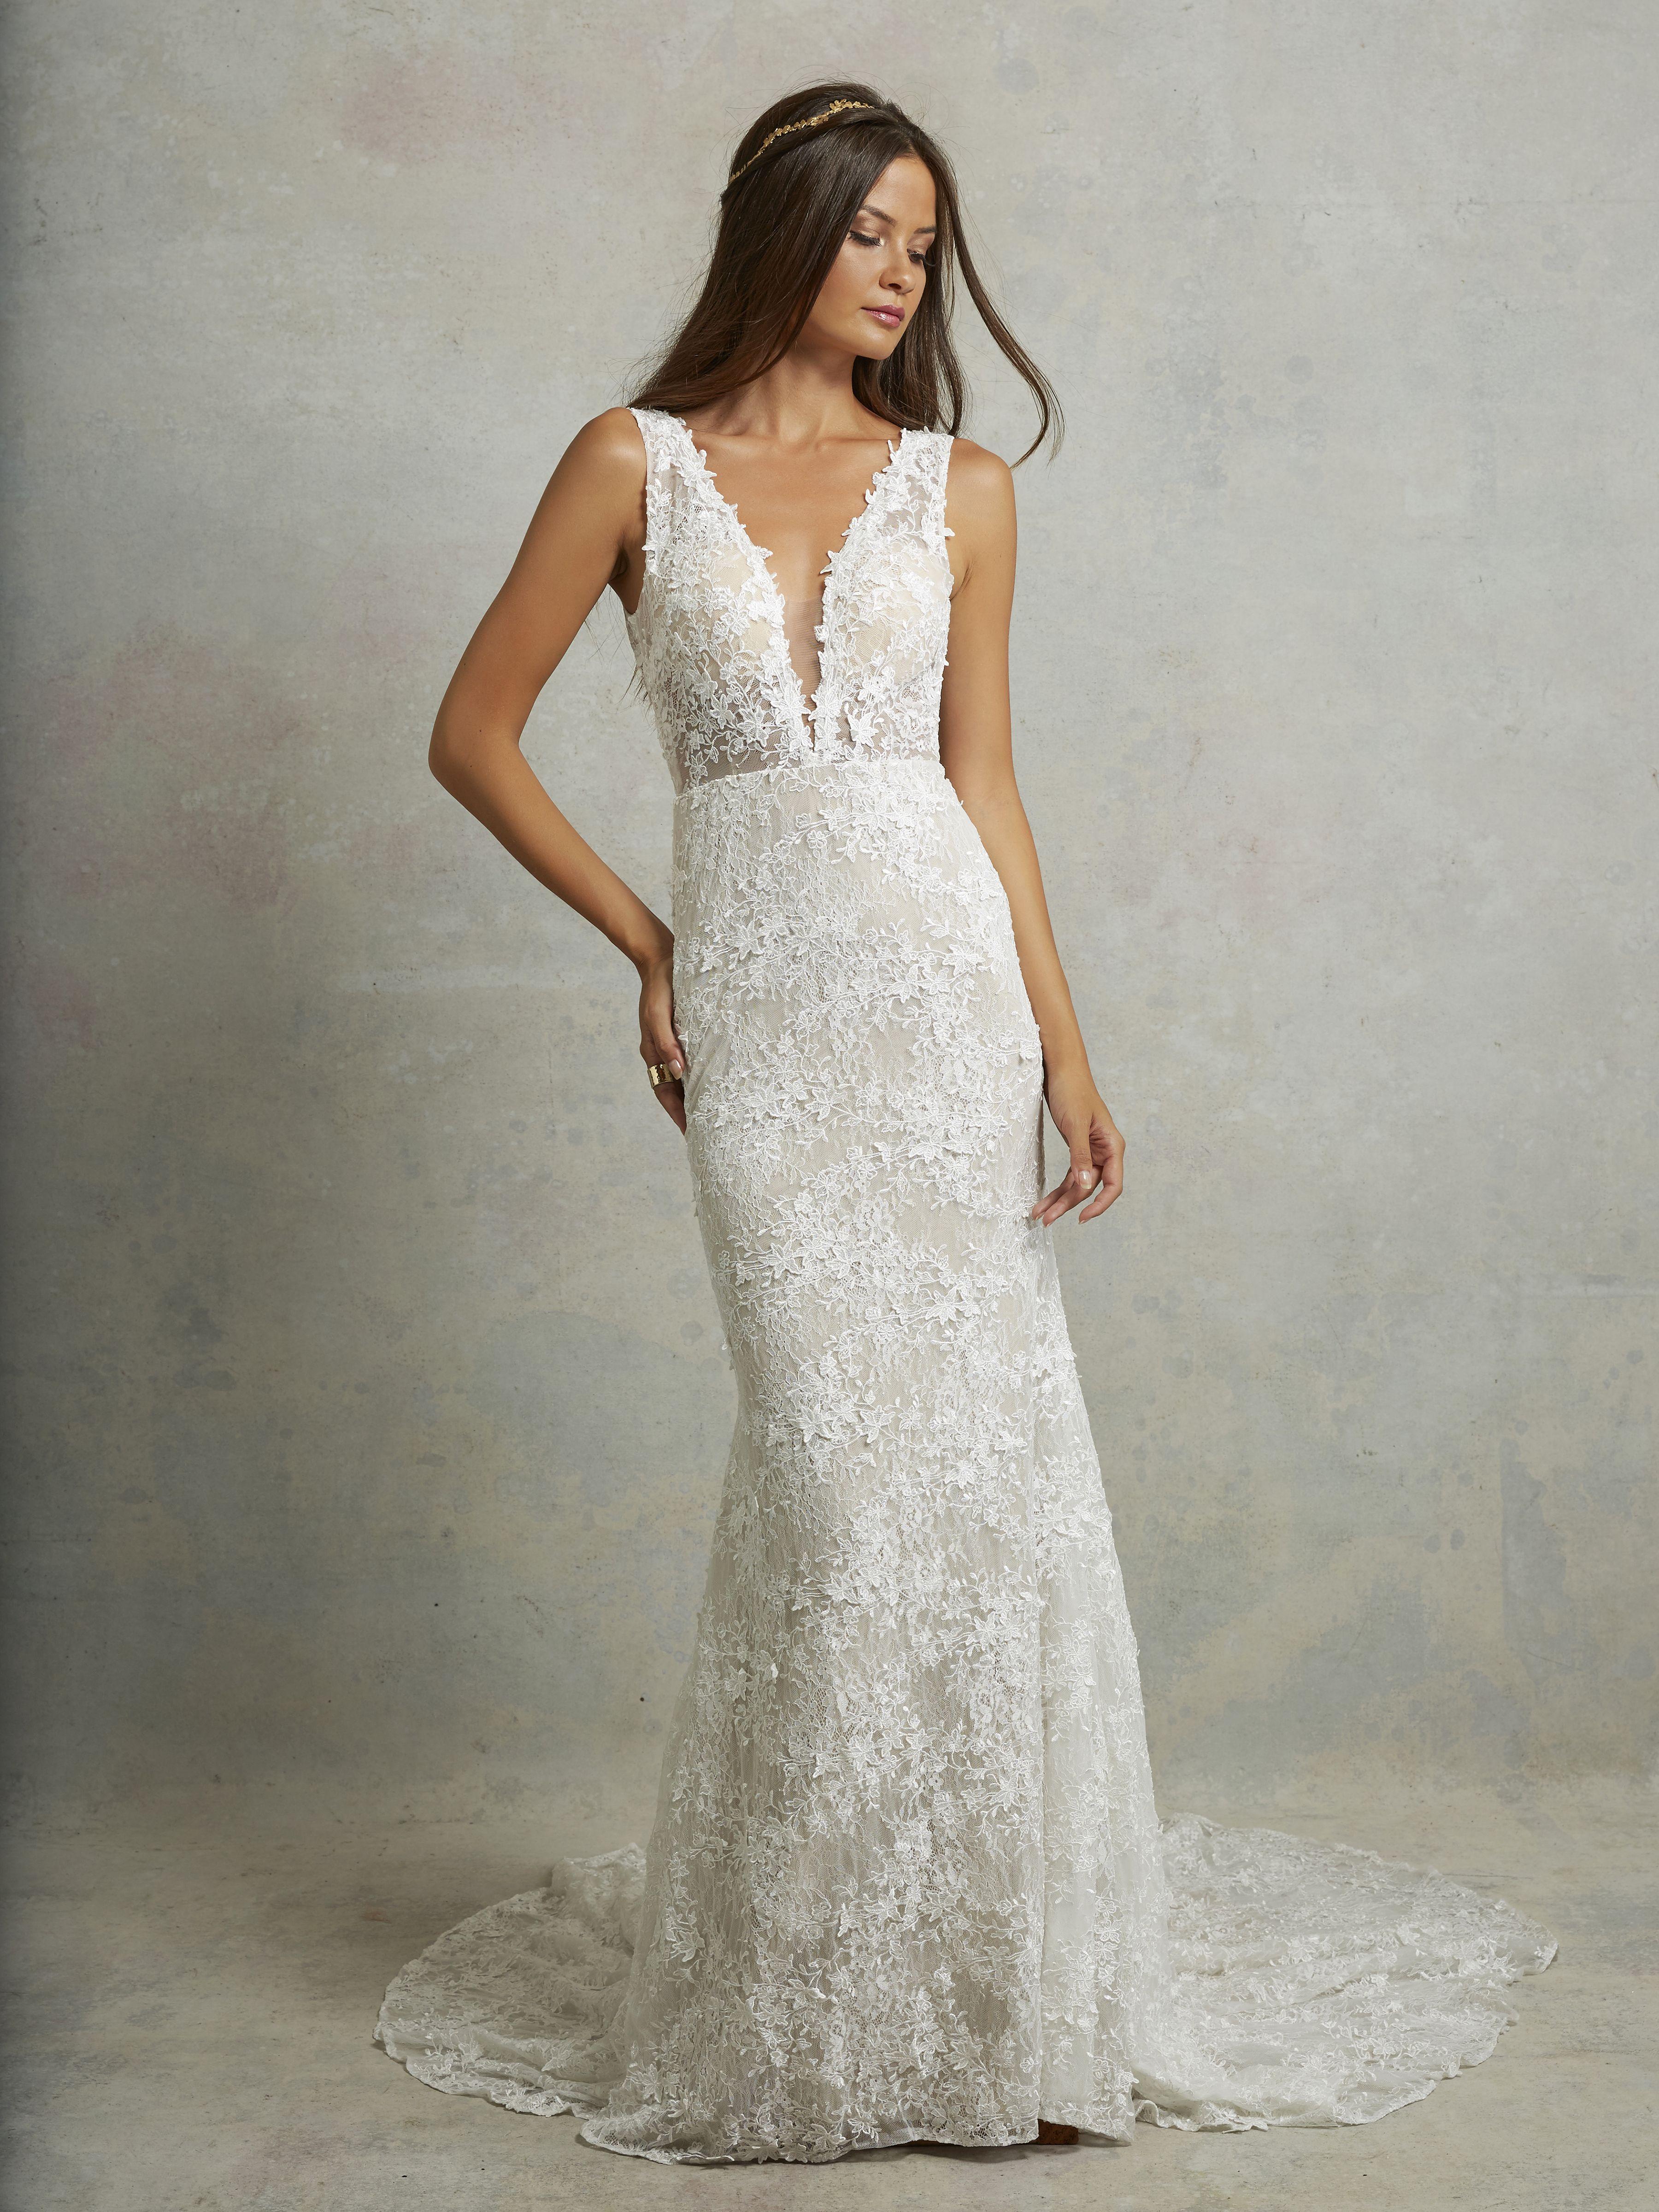 Wedding Dress Consignment Las Vegas Nv Raveitsafe